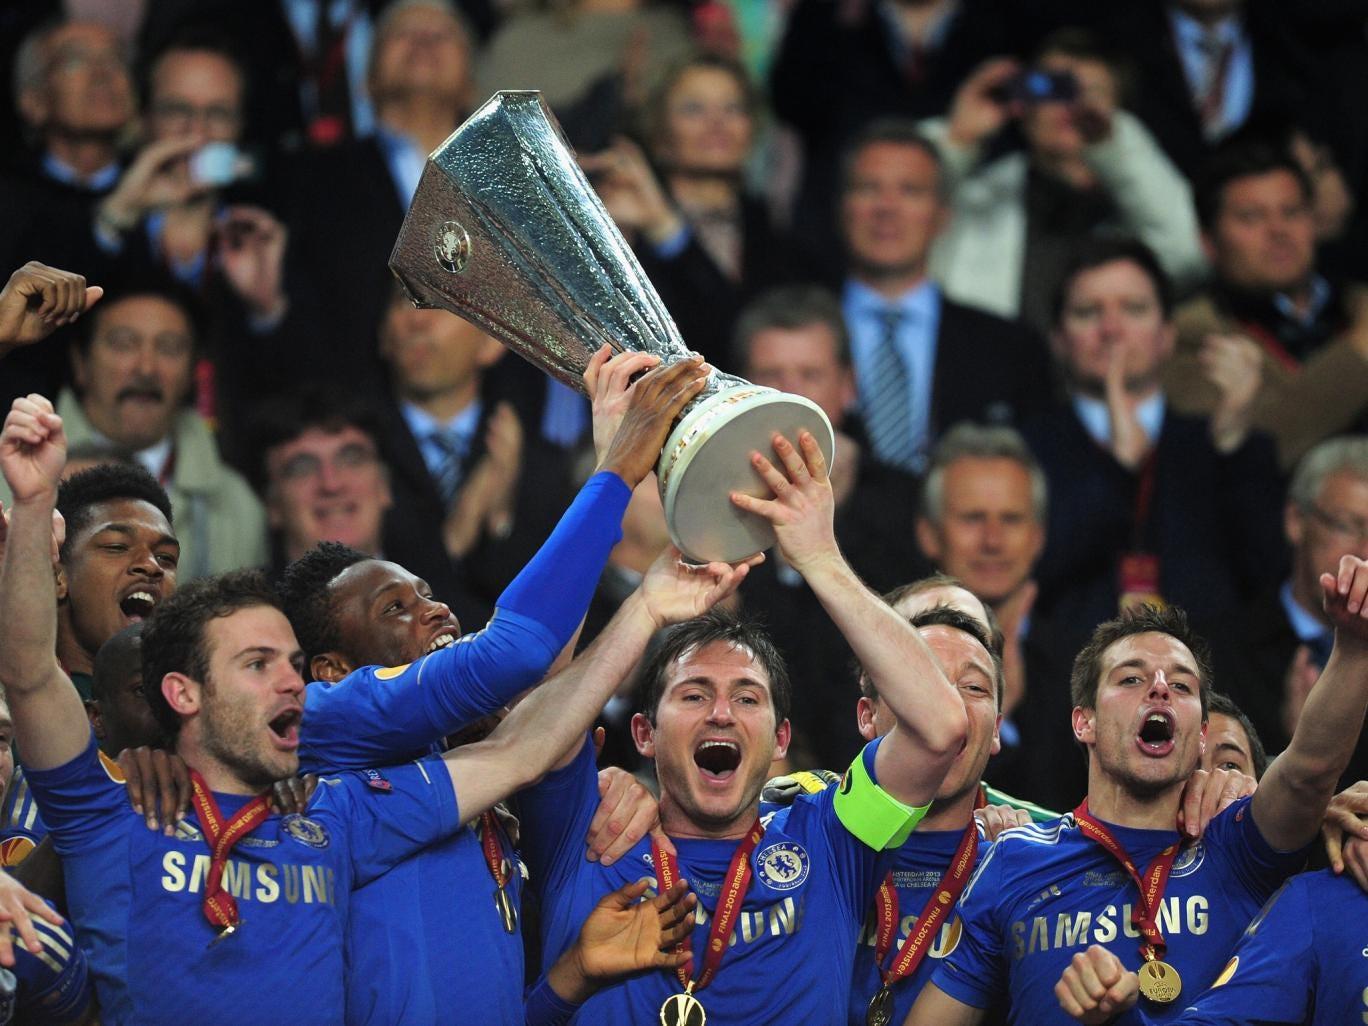 Frank Lampard lifts the Europa League trophy